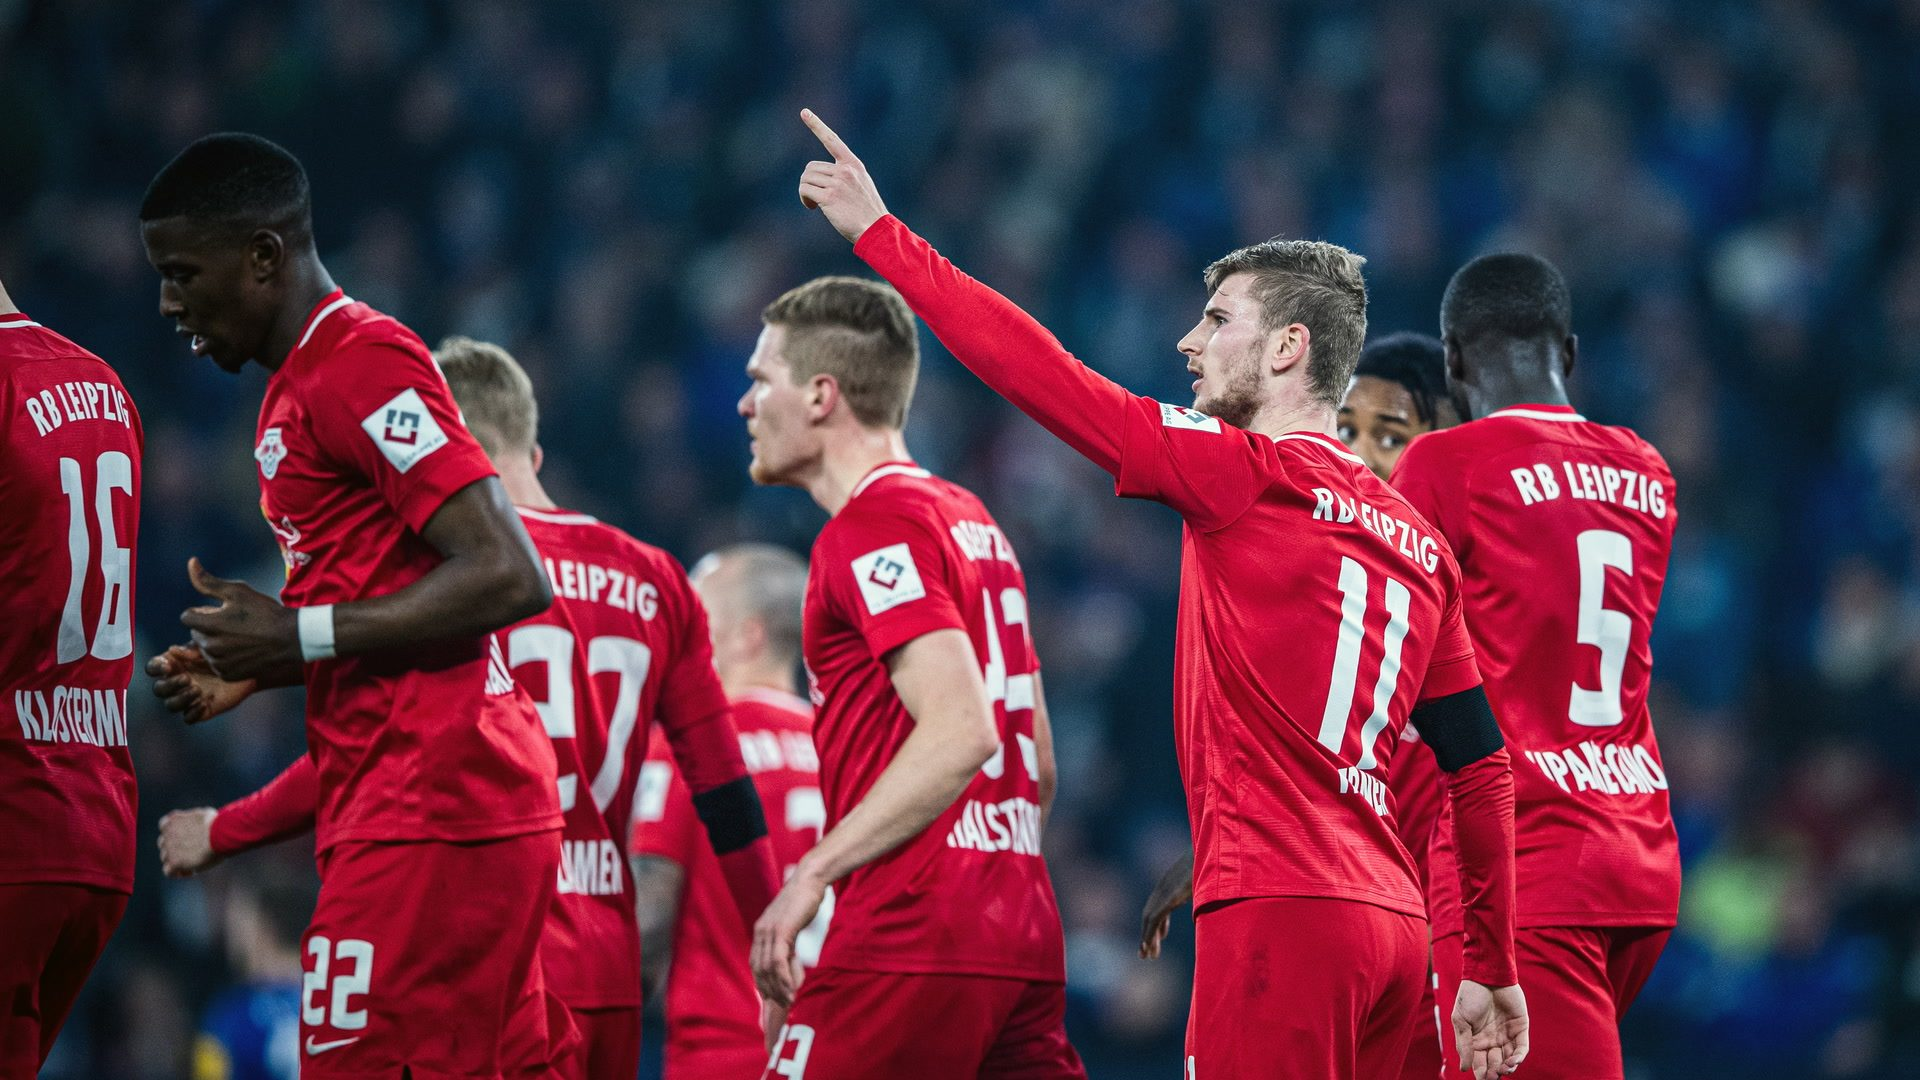 Bundesliga Timo Werner Back Among The Goals As Rb Leipzig Thrash Schalke